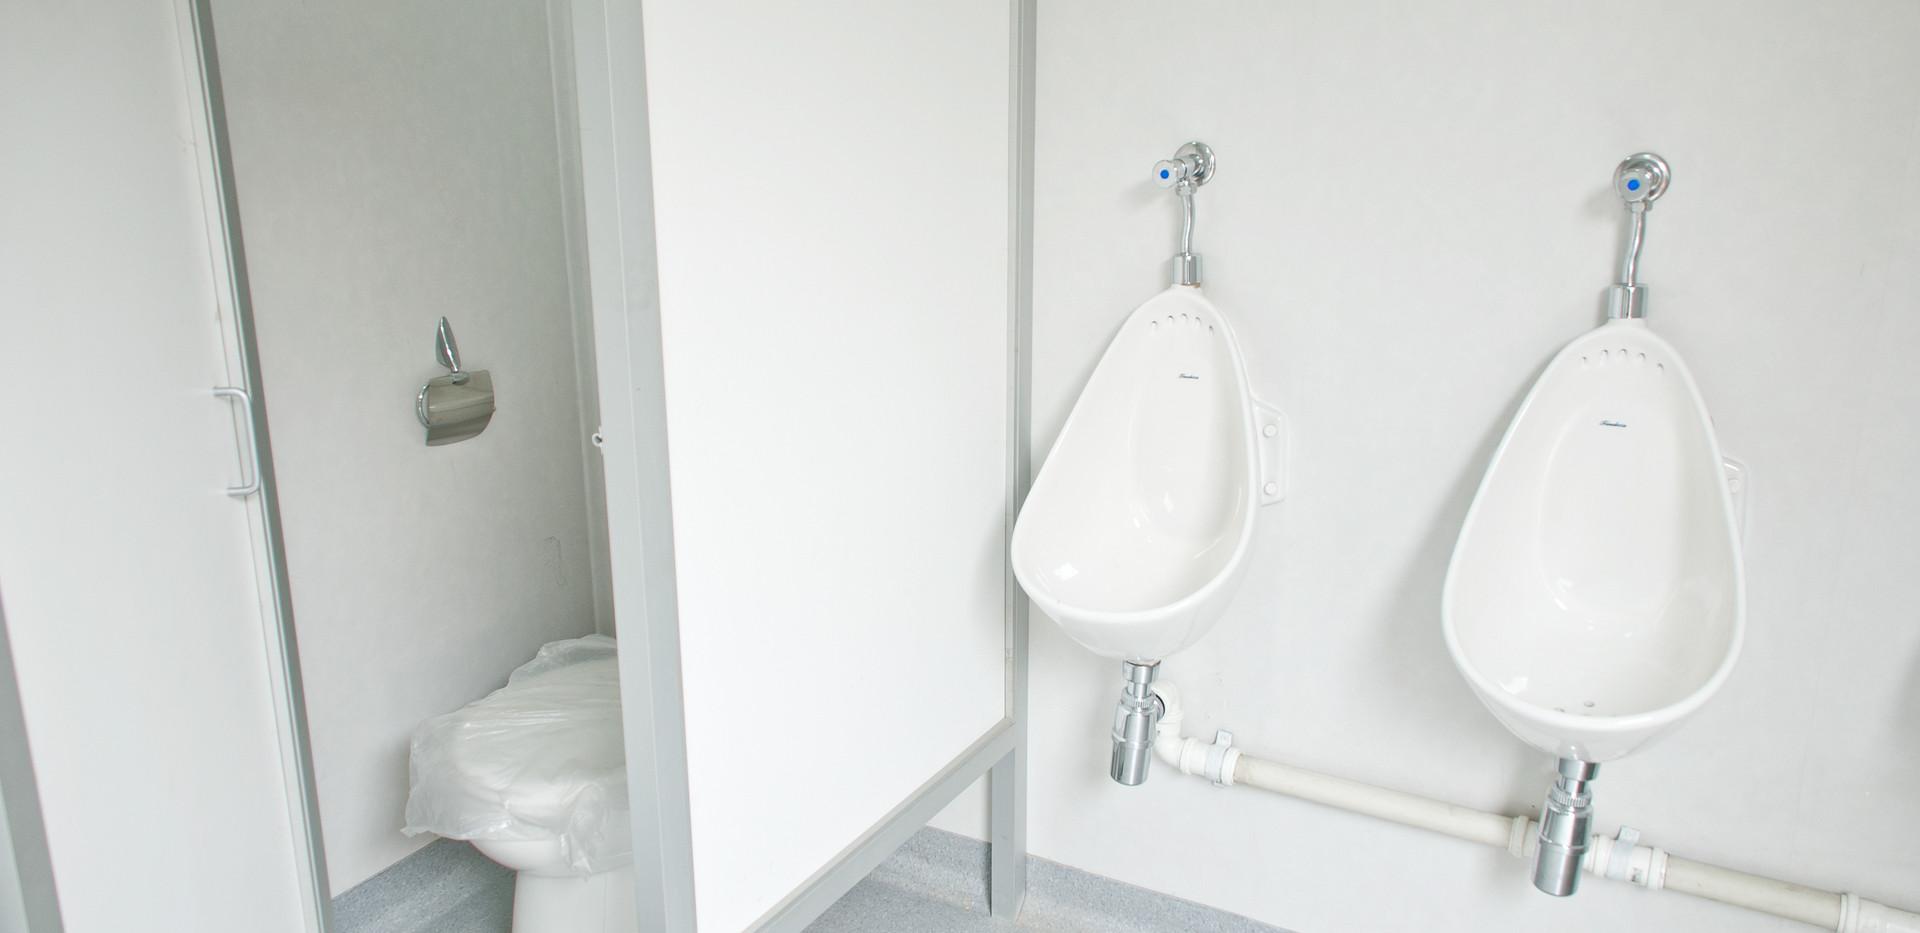 interior_baño_movil_de_lujo.jpg